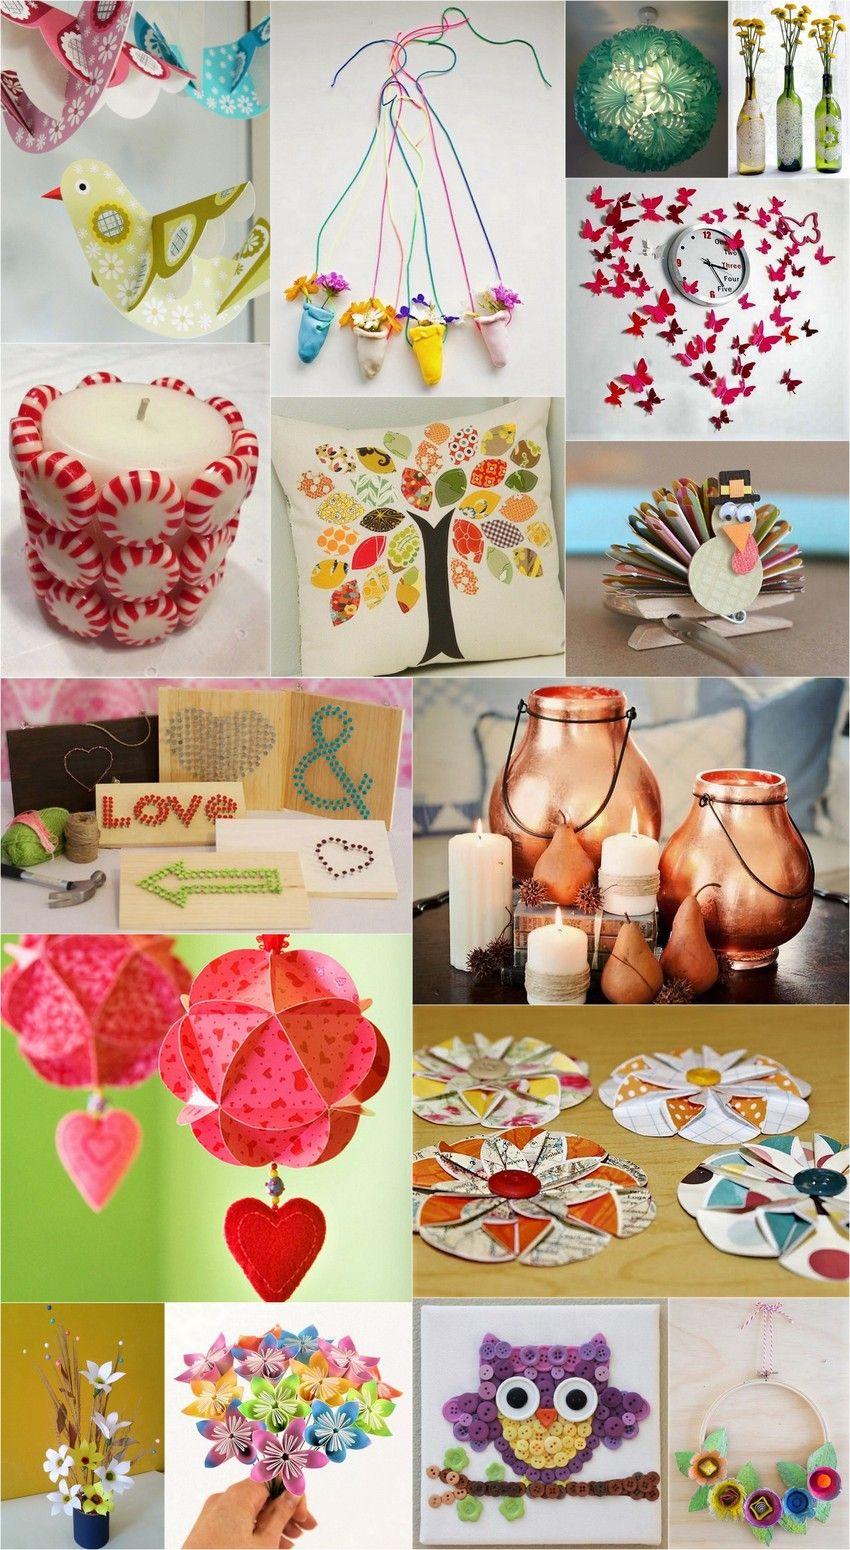 Diy Amazing Creative Crafts Ideas Crafts Pinterest Crafts